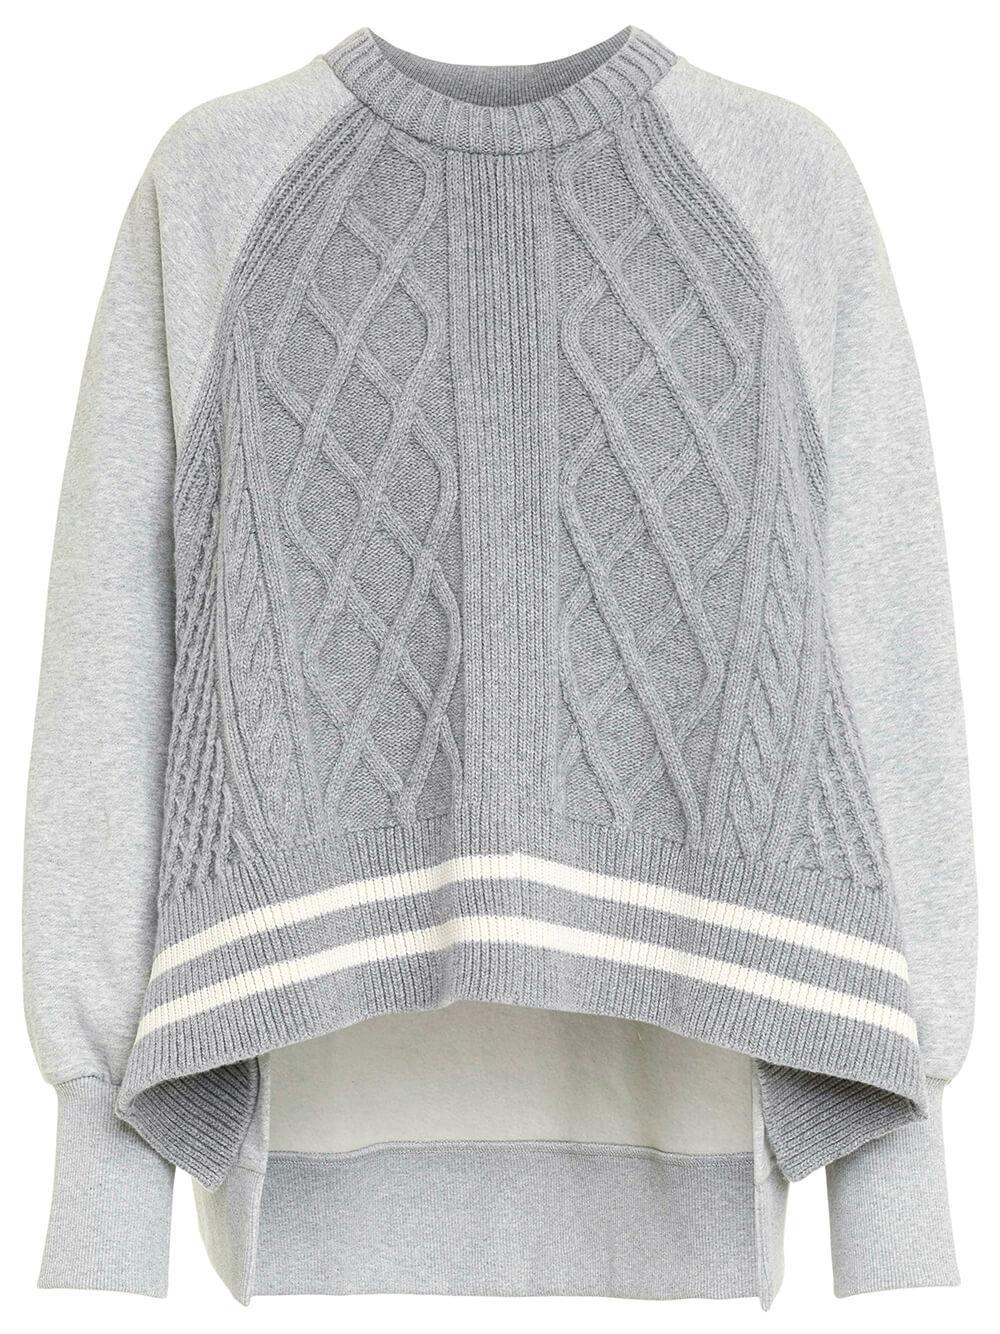 Structured Ease Sweatshirt Item # 213-428601